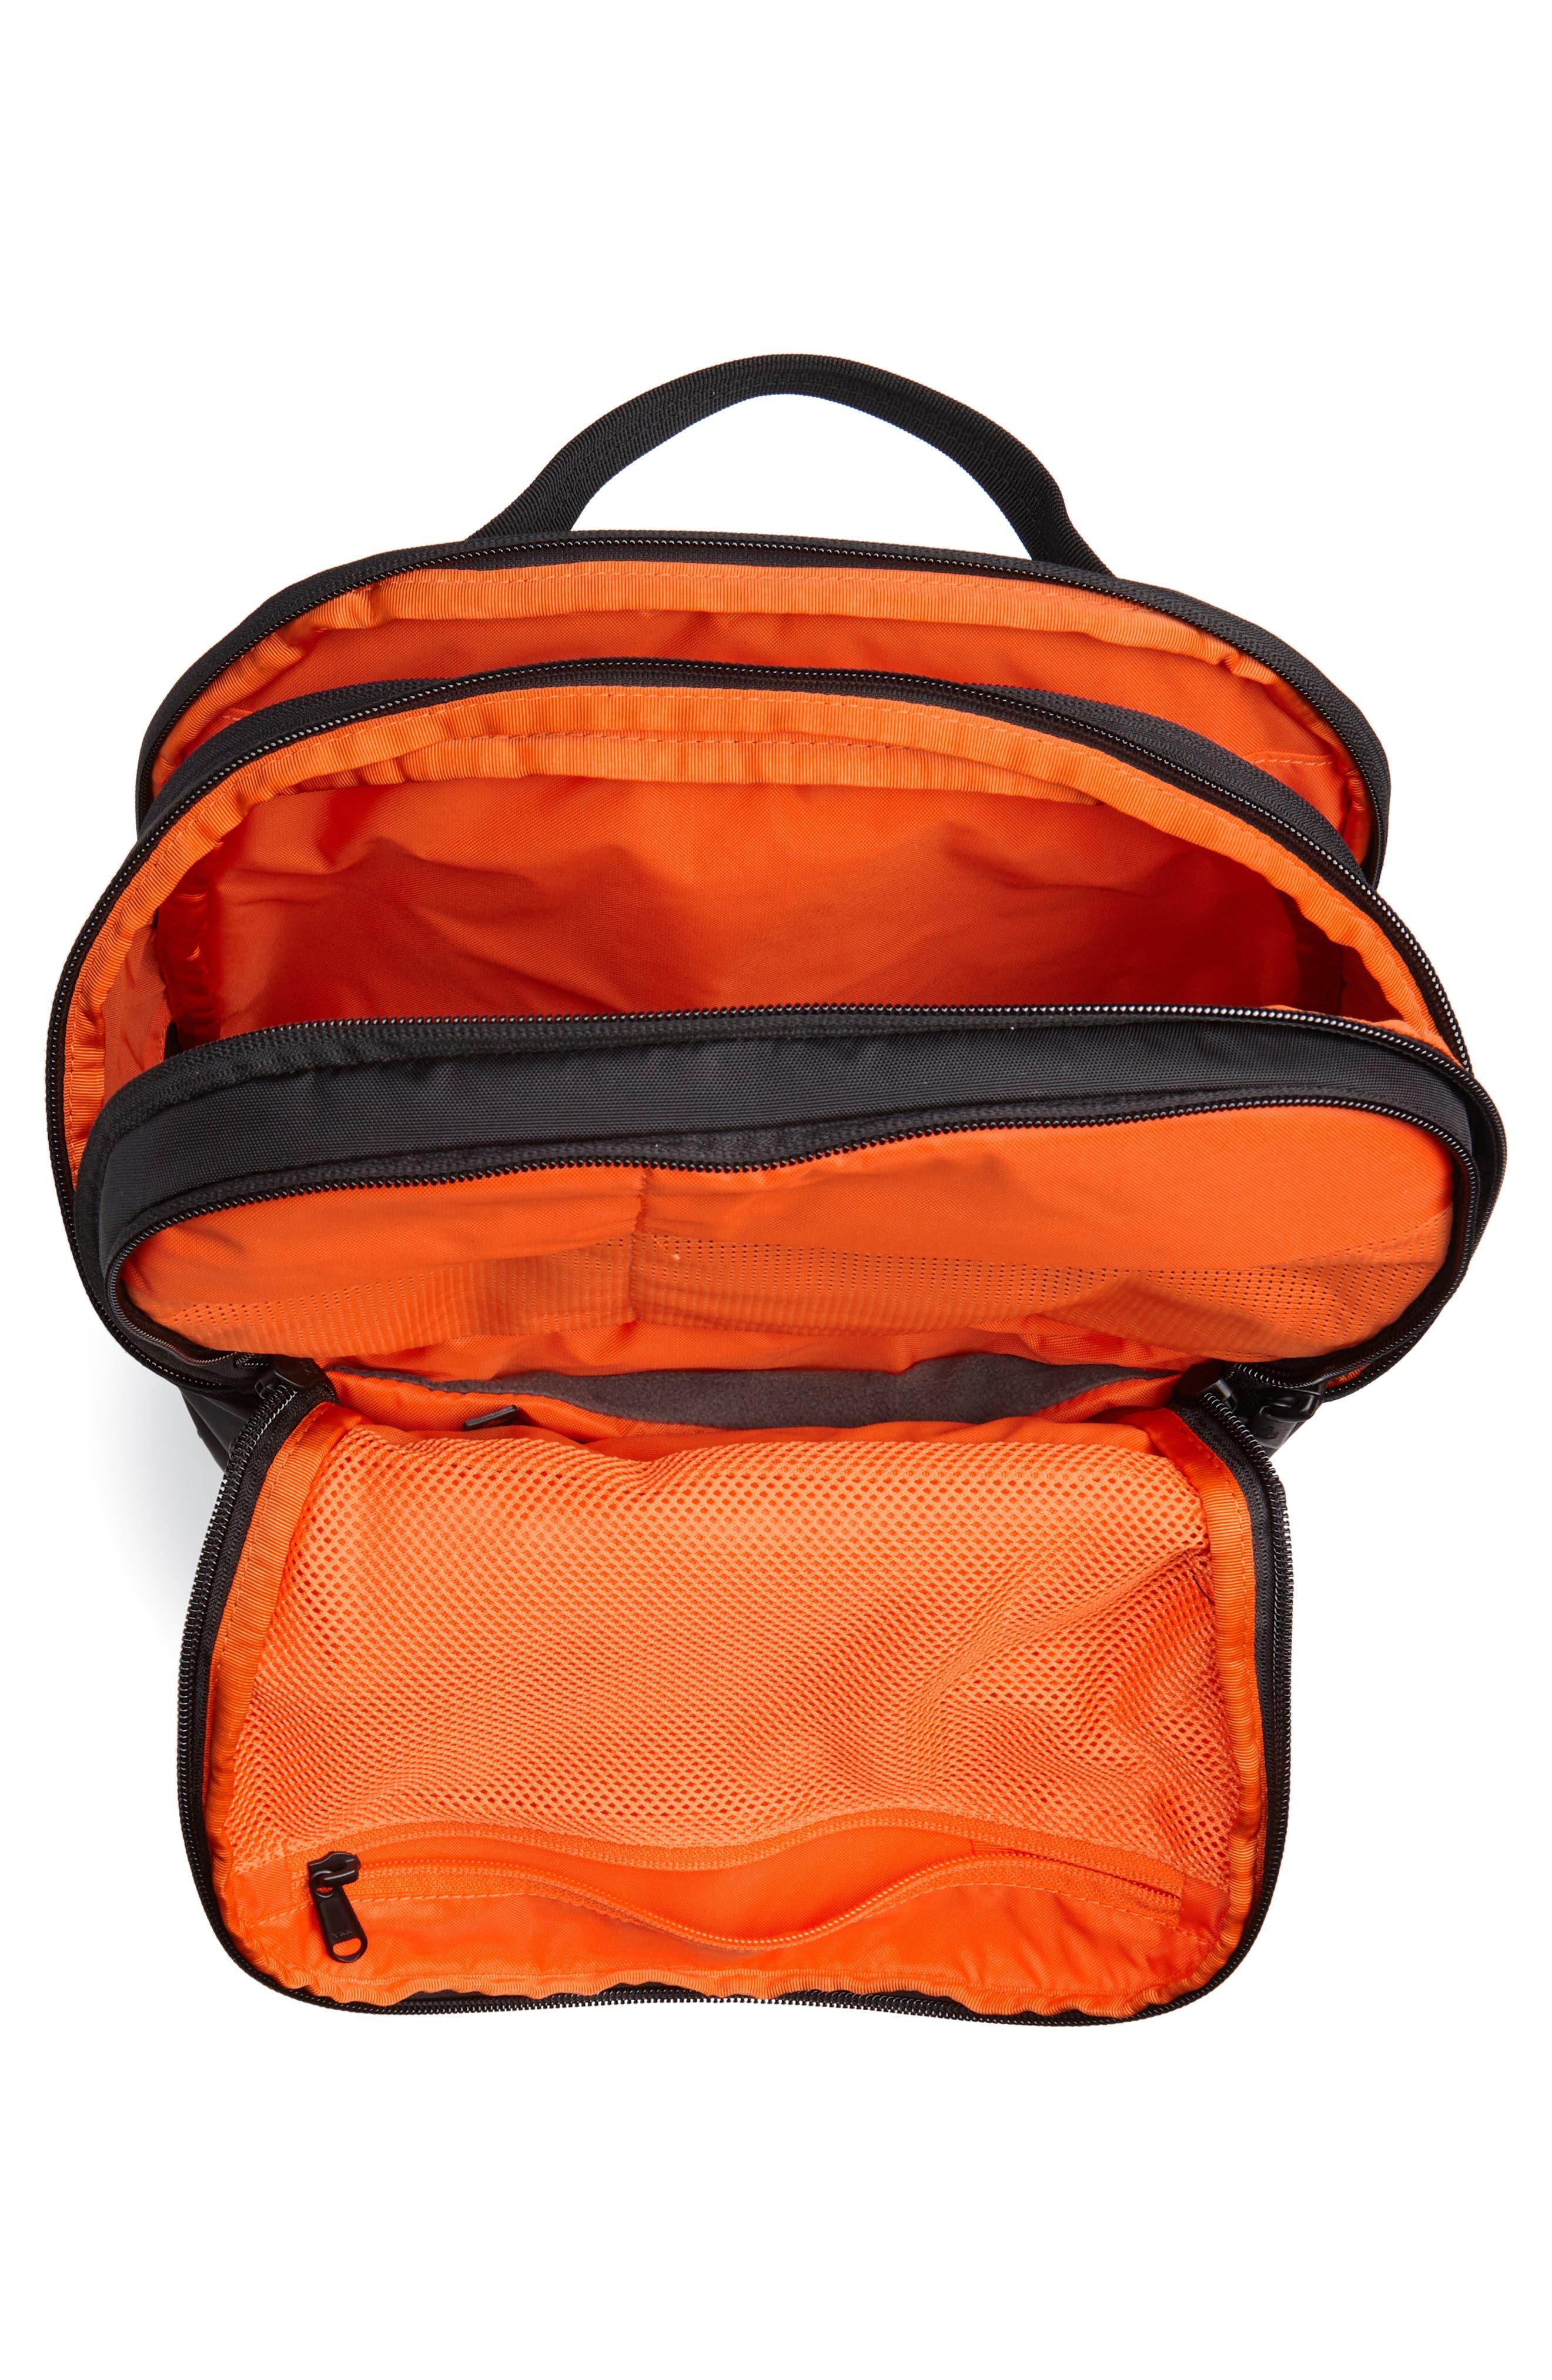 Ka-Ban Backpack,                             Alternate thumbnail 4, color,                             TAUPE GREEN/ MACROFLECK PRINT